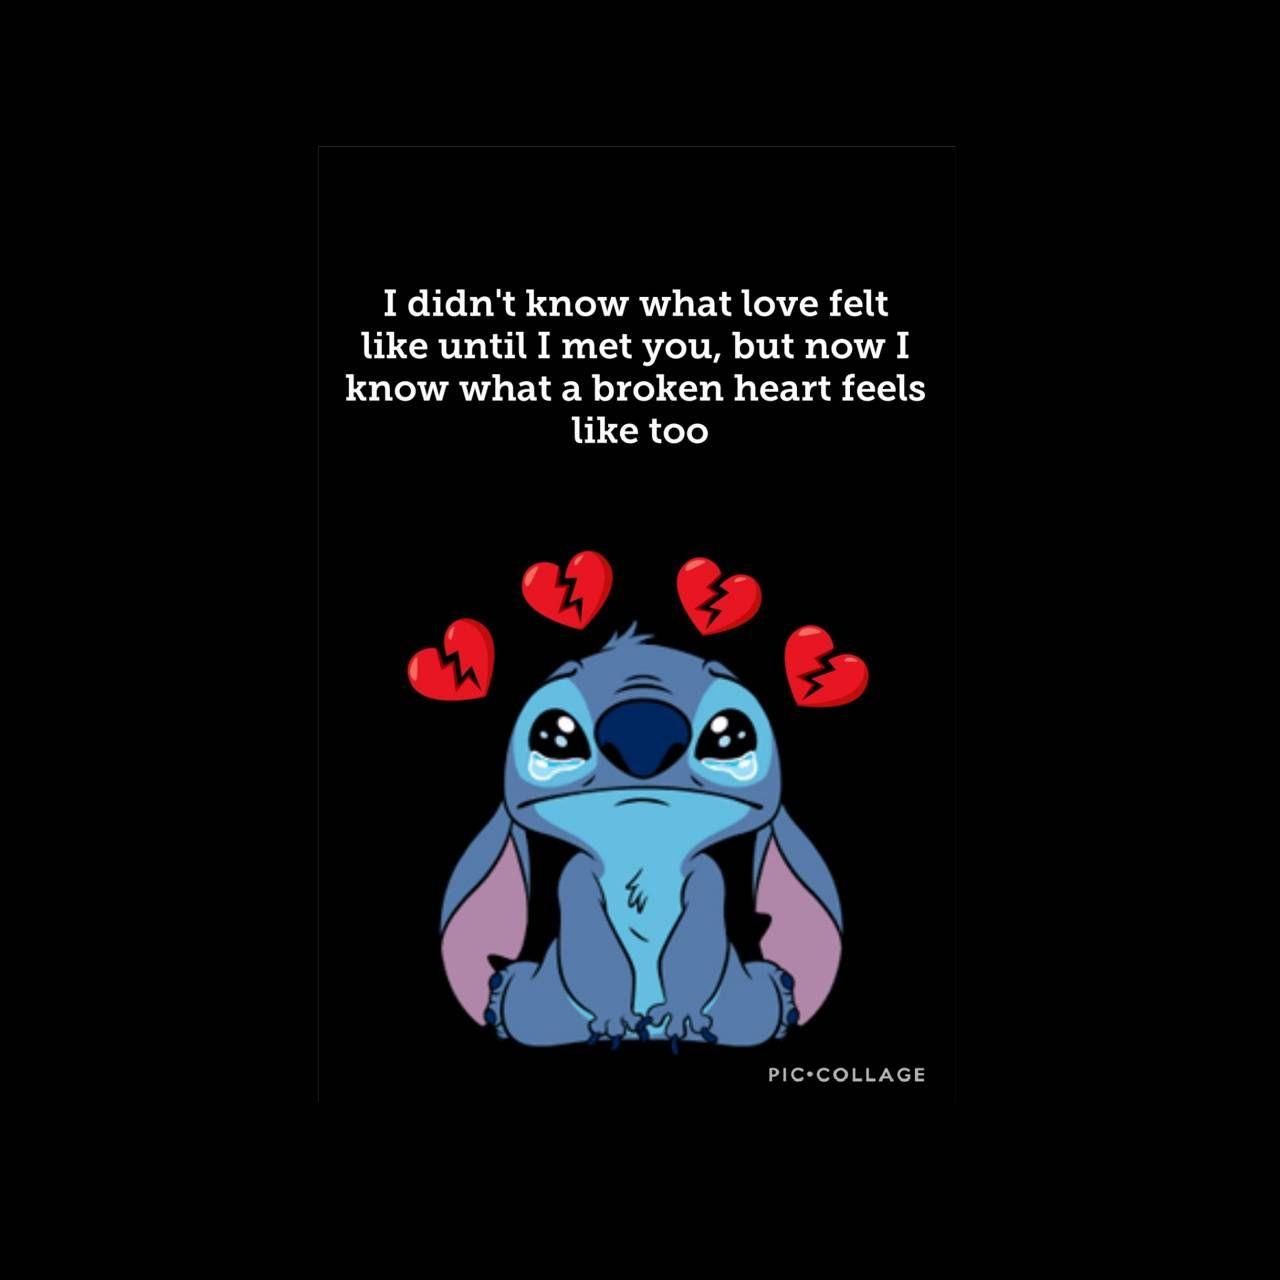 Download Heartbroken Stitch Wallpaper By Amberz18 09 Free On Zedge Now Browse Millions Heartbreak Wallpaper Broken Heart Wallpaper Lilo And Stitch Quotes Broken hearted lock screen love quotes